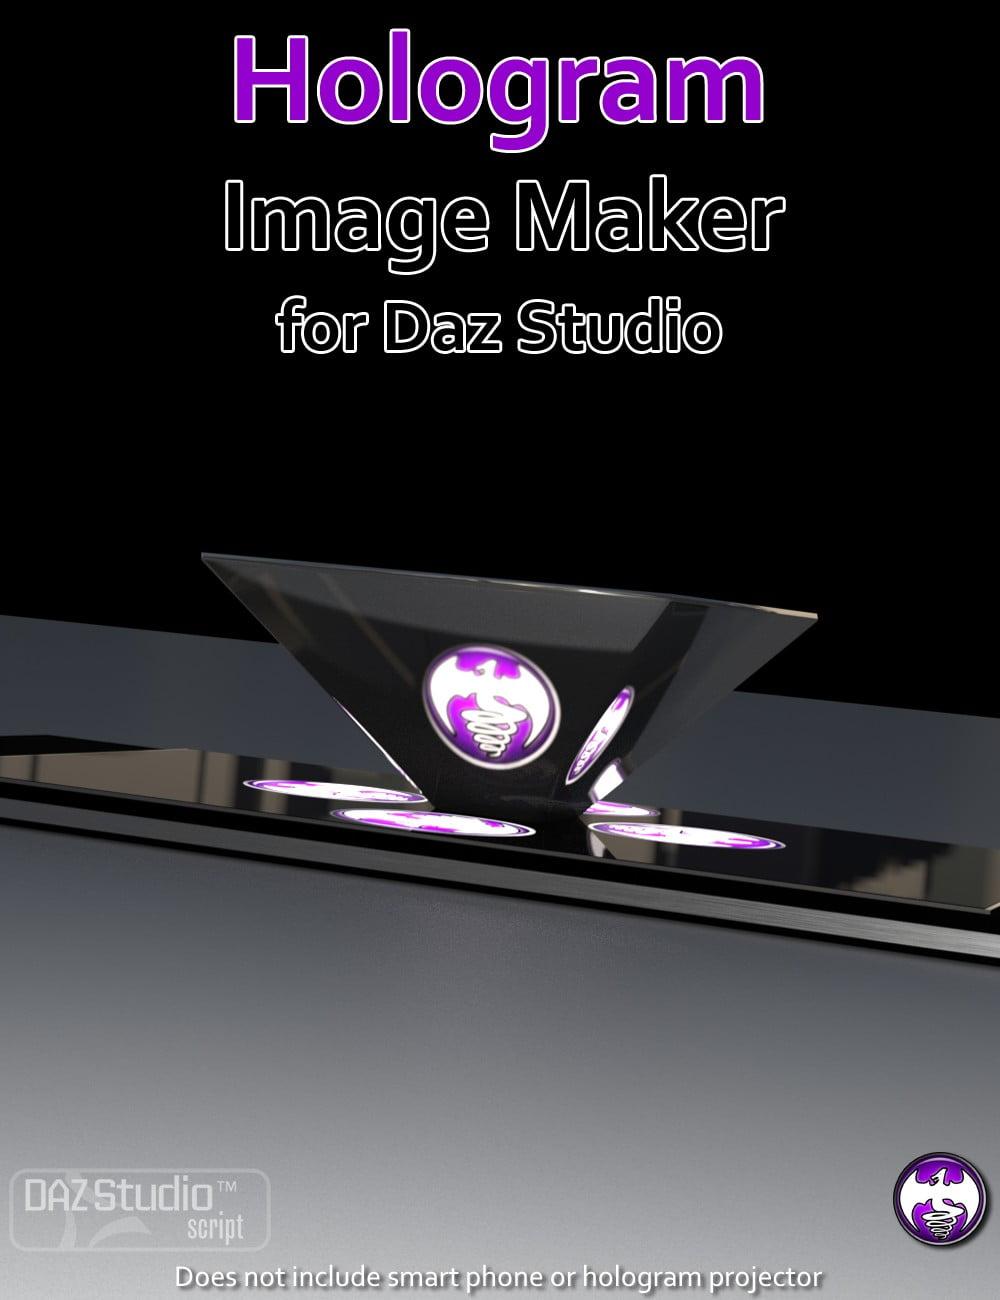 00-main-hologram-image-maker-for-daz-studio-daz3d